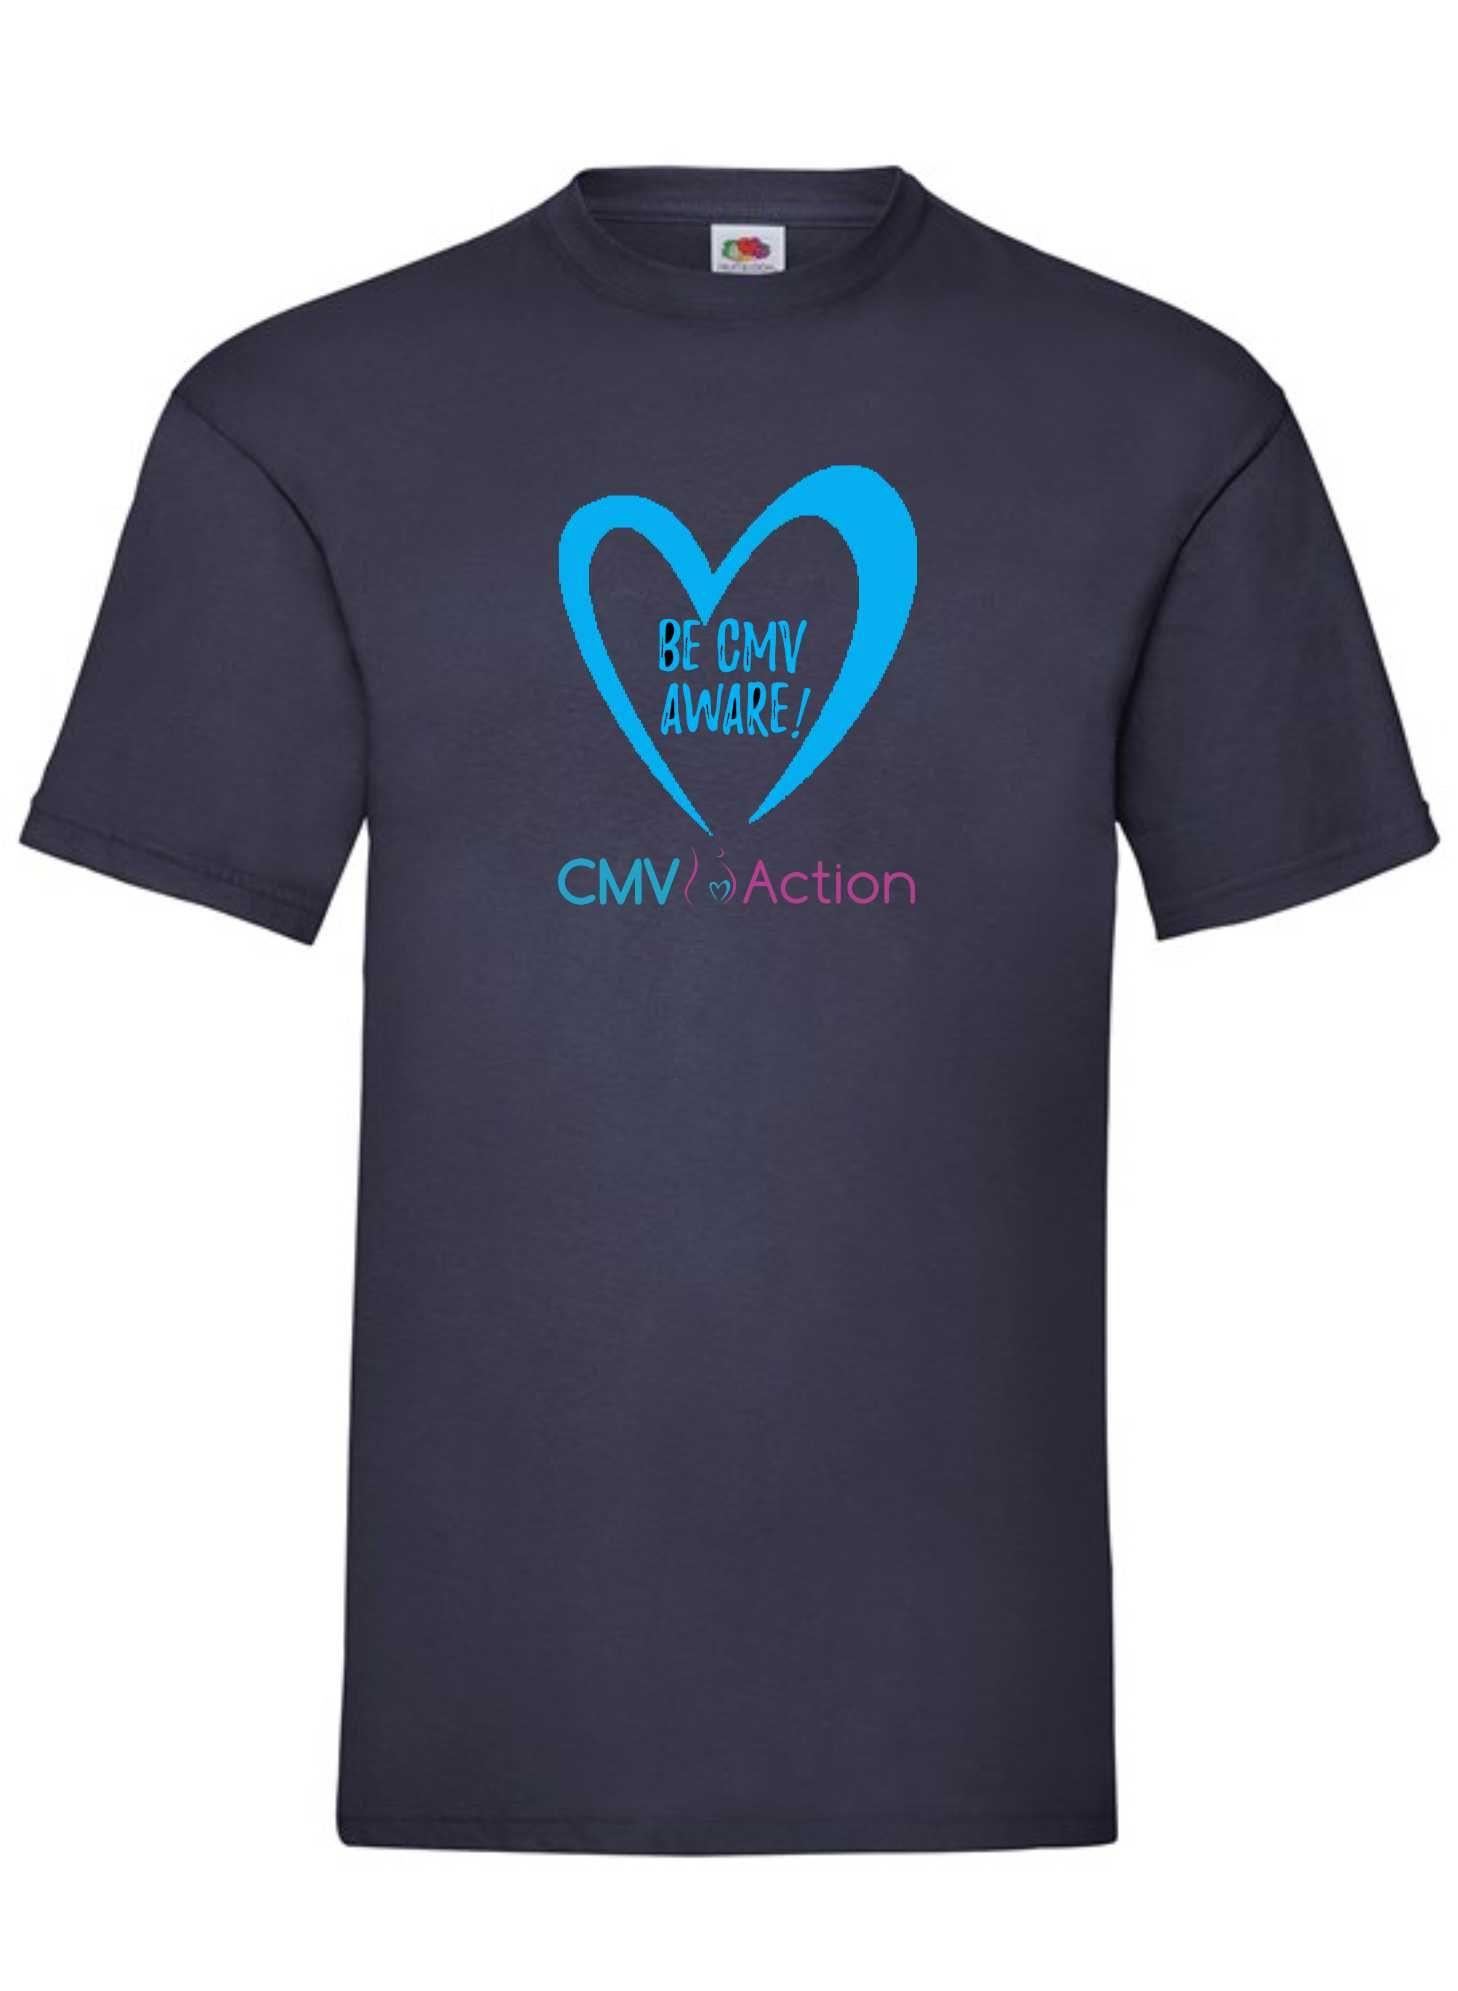 CMV- Blue Heart Tee (Navy) (Unisex)